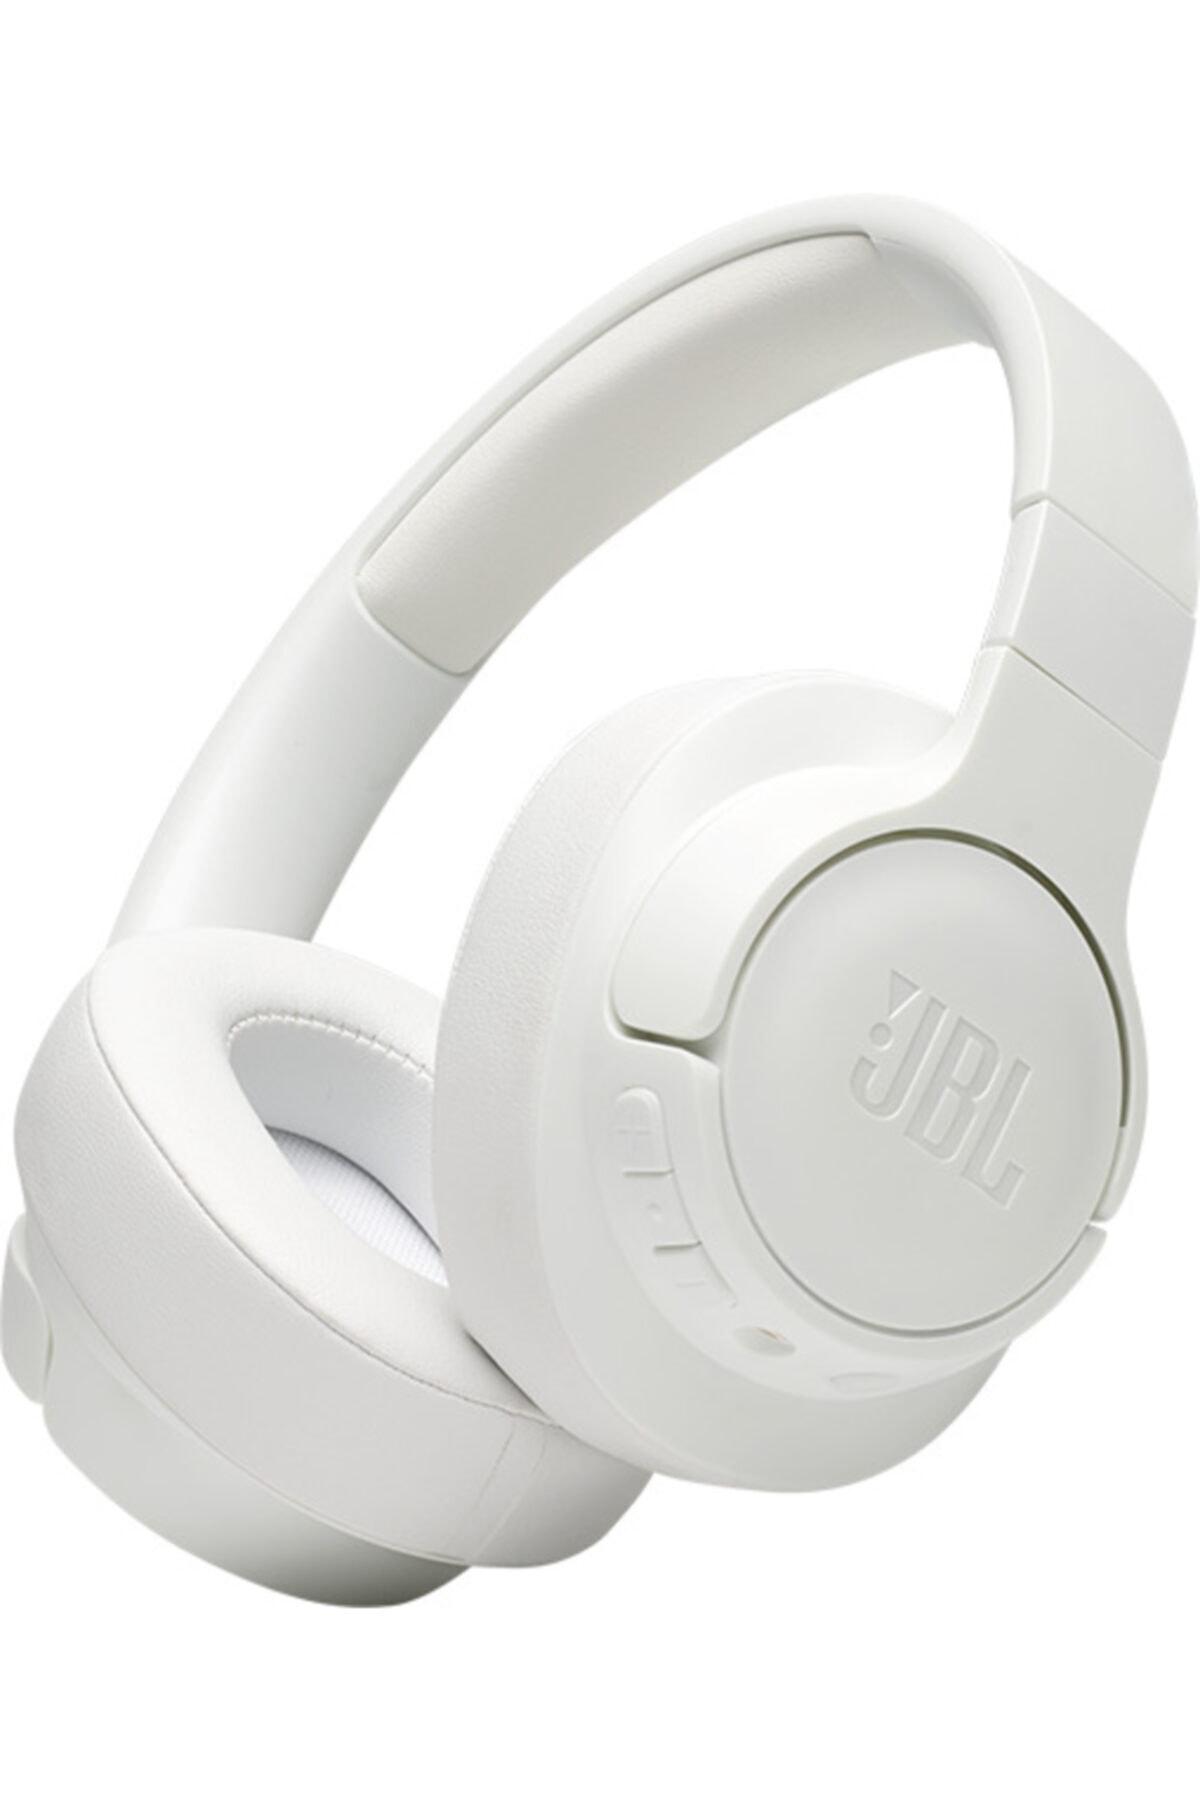 T700BT Kulaküstü Bluetooth Kulaklık - Beyaz